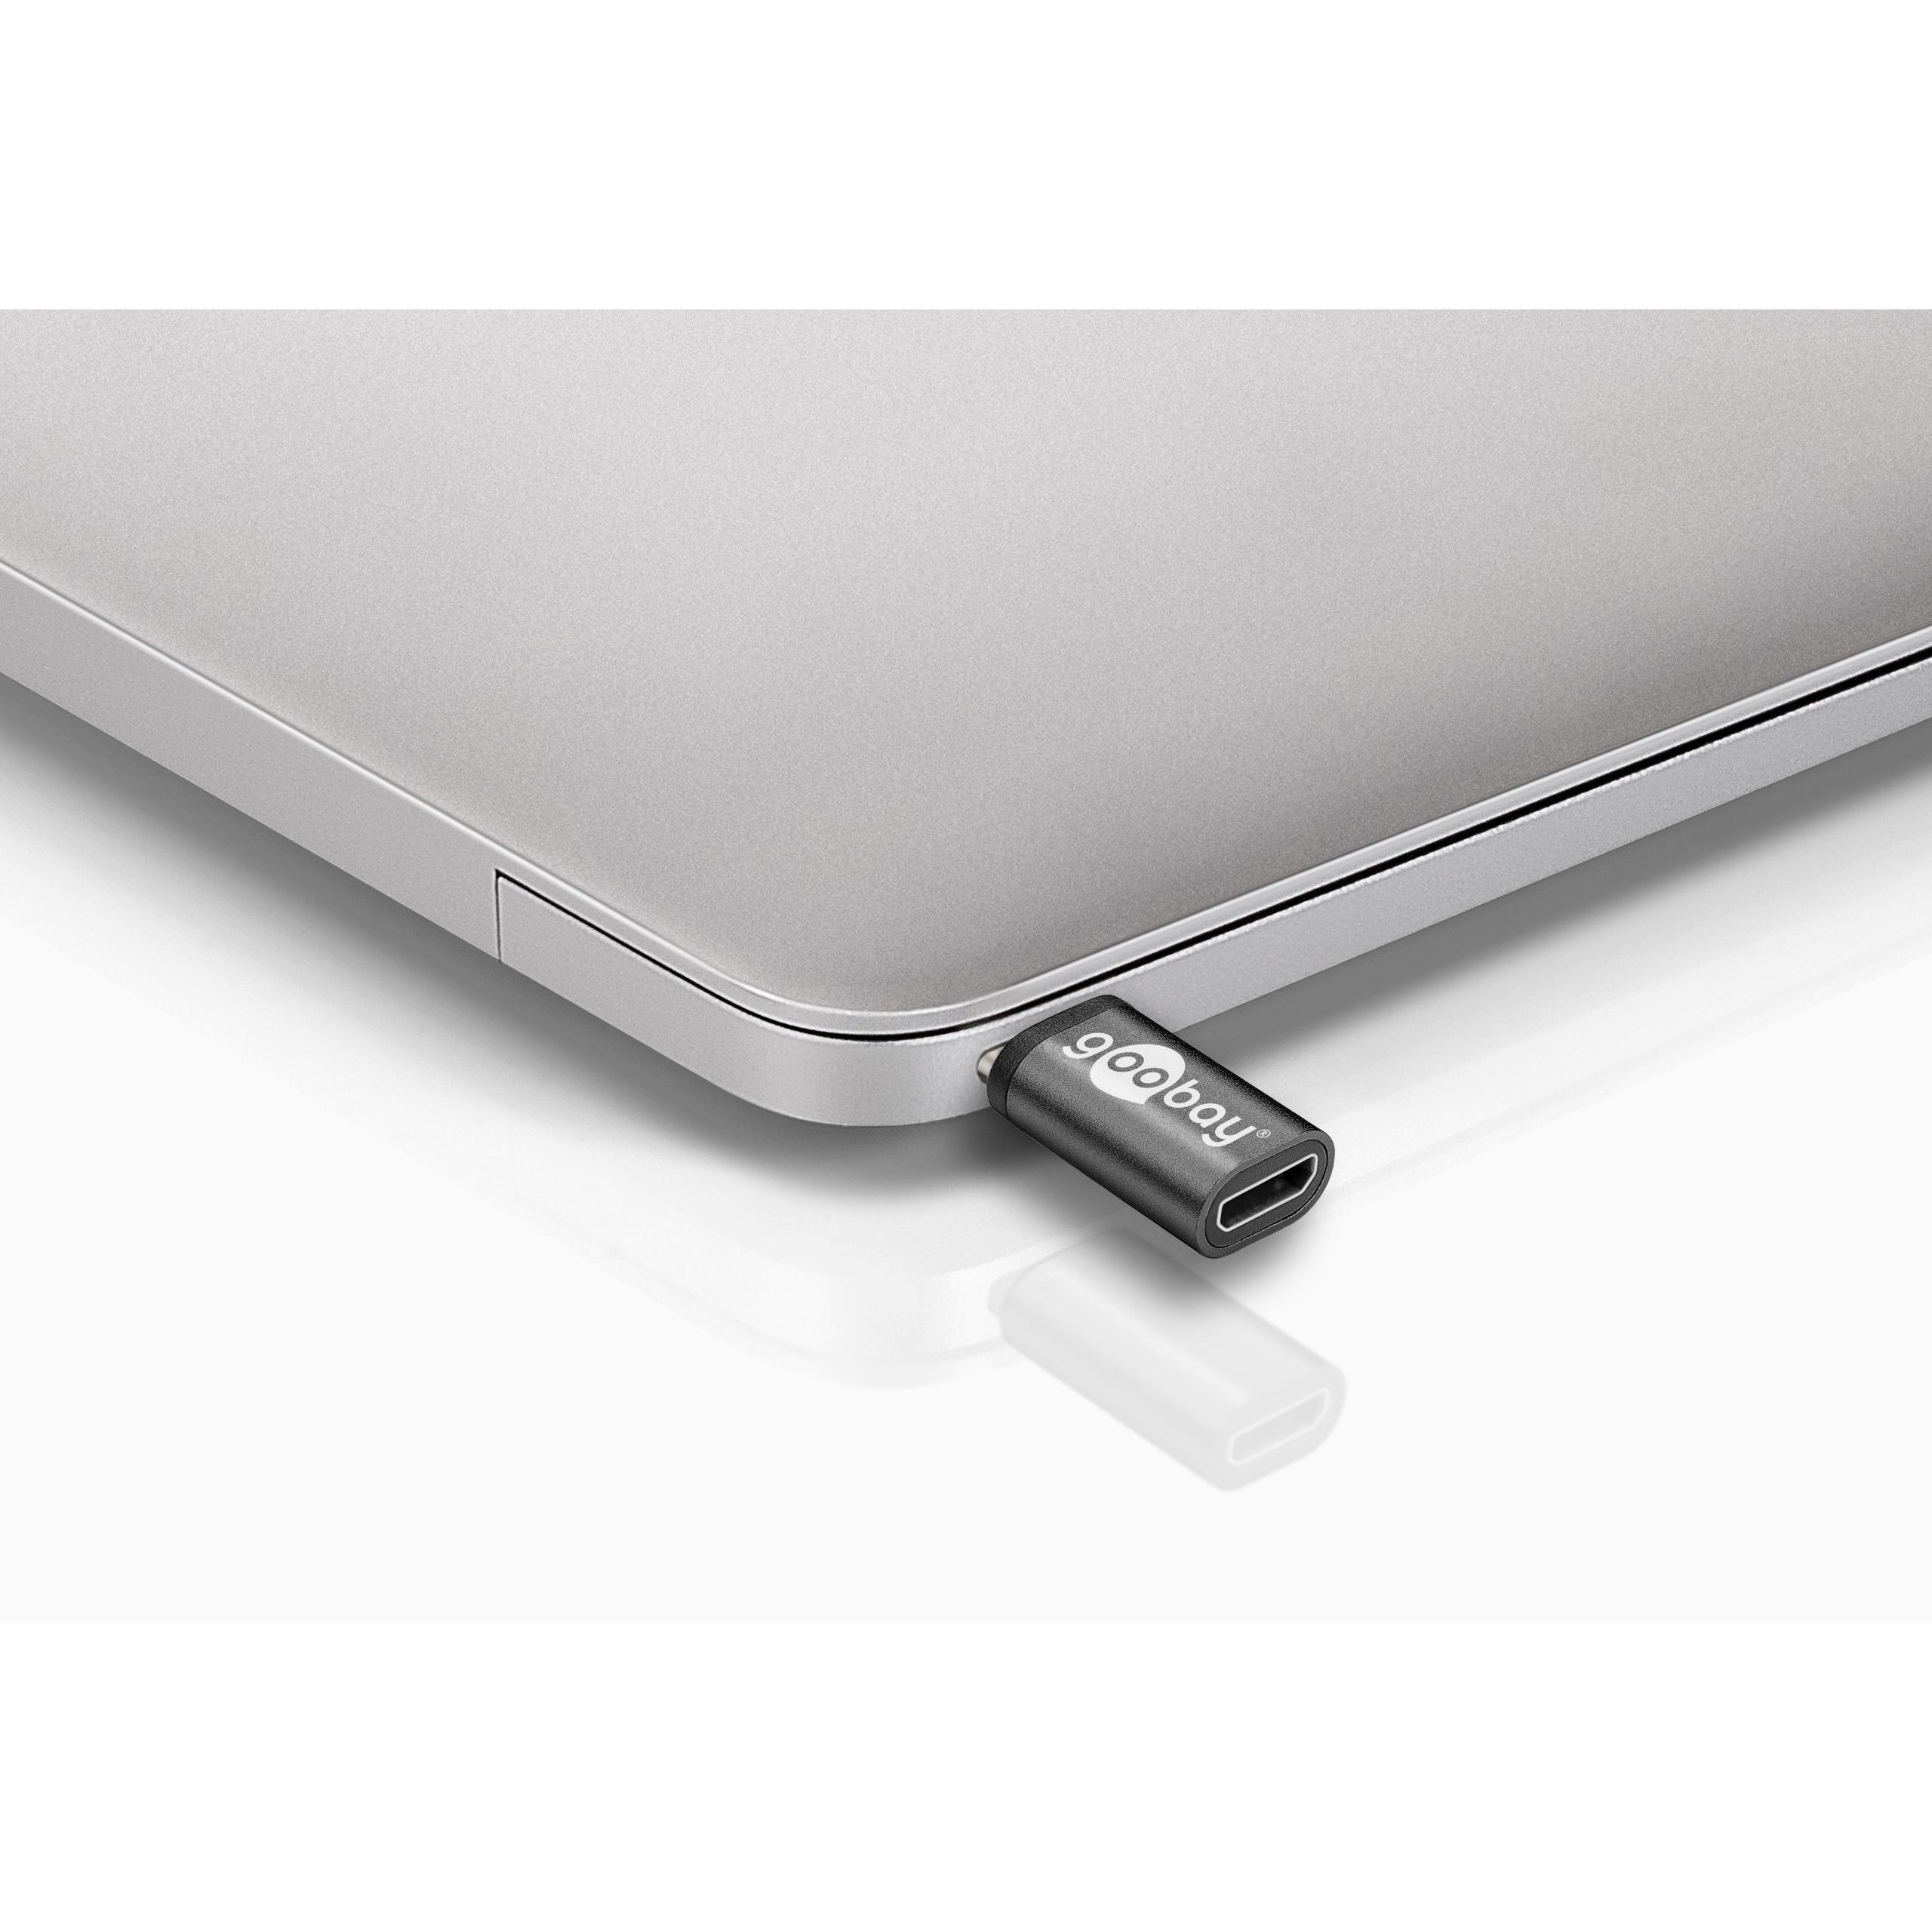 Adattatore USB-C™ Maschio a USB Micro-B Femmina Nero